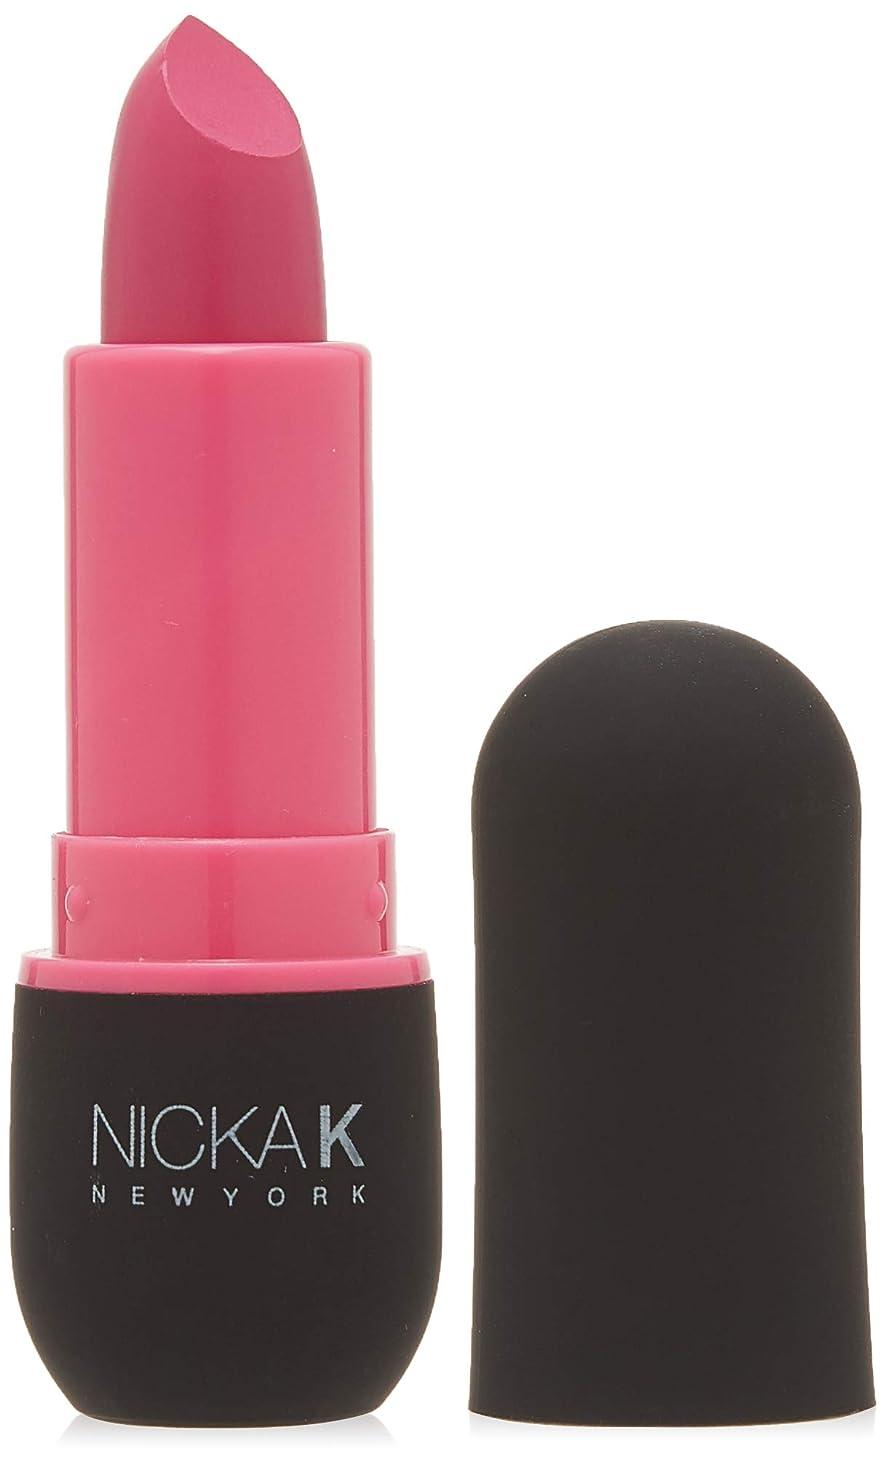 手首議会無謀NICKA K Vivid Matte Lipstick - NMS06 Hot Pink (並行輸入品)